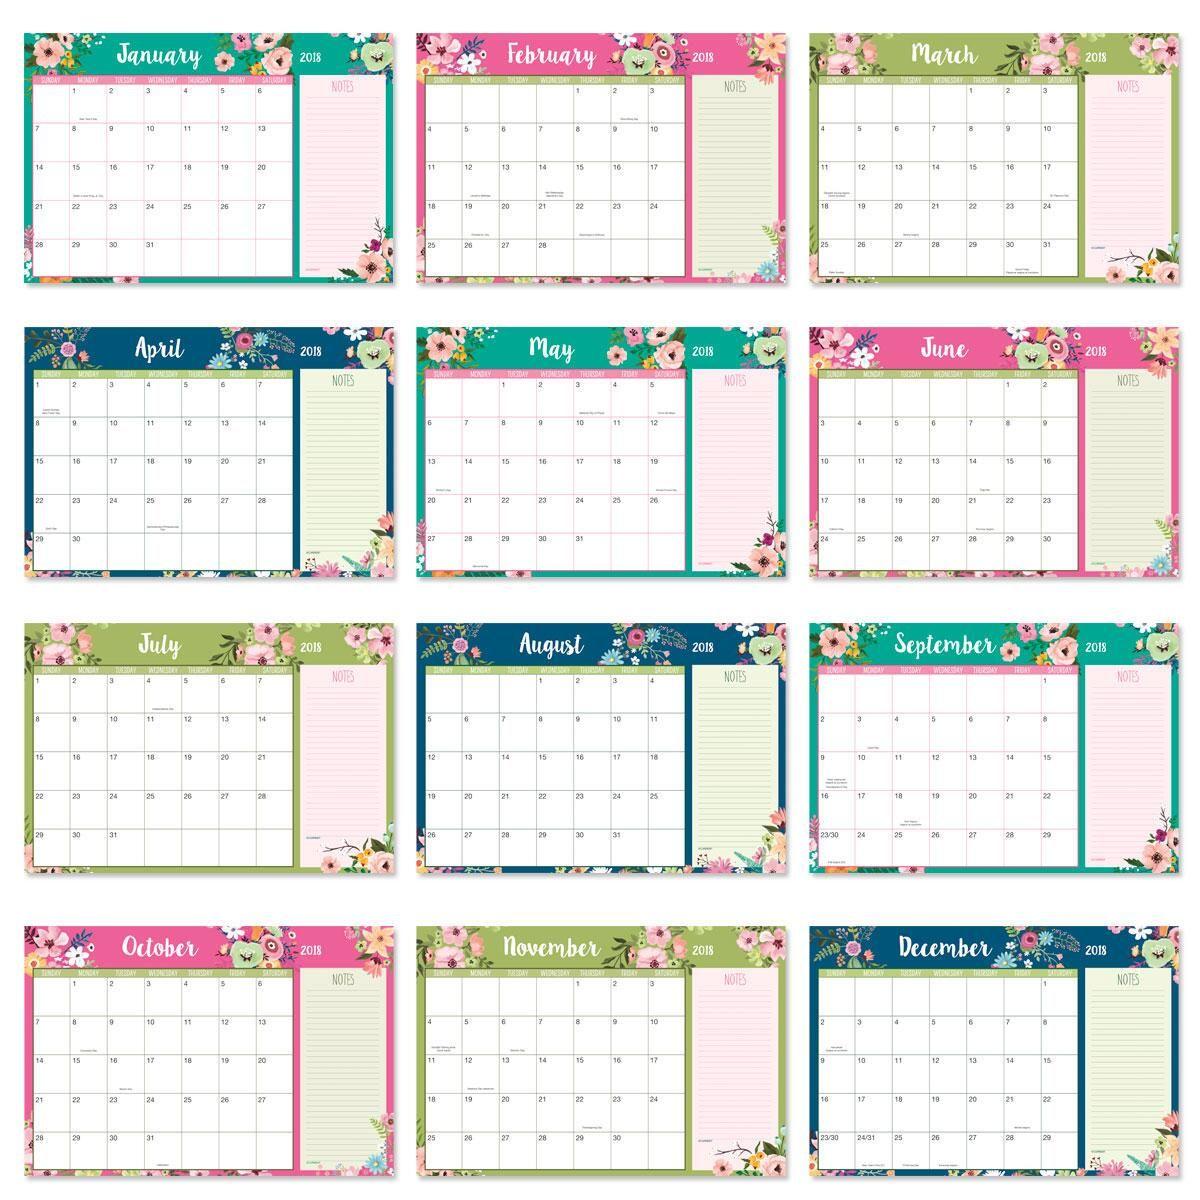 2018-2019 Floral Fantasy Calendar Pad